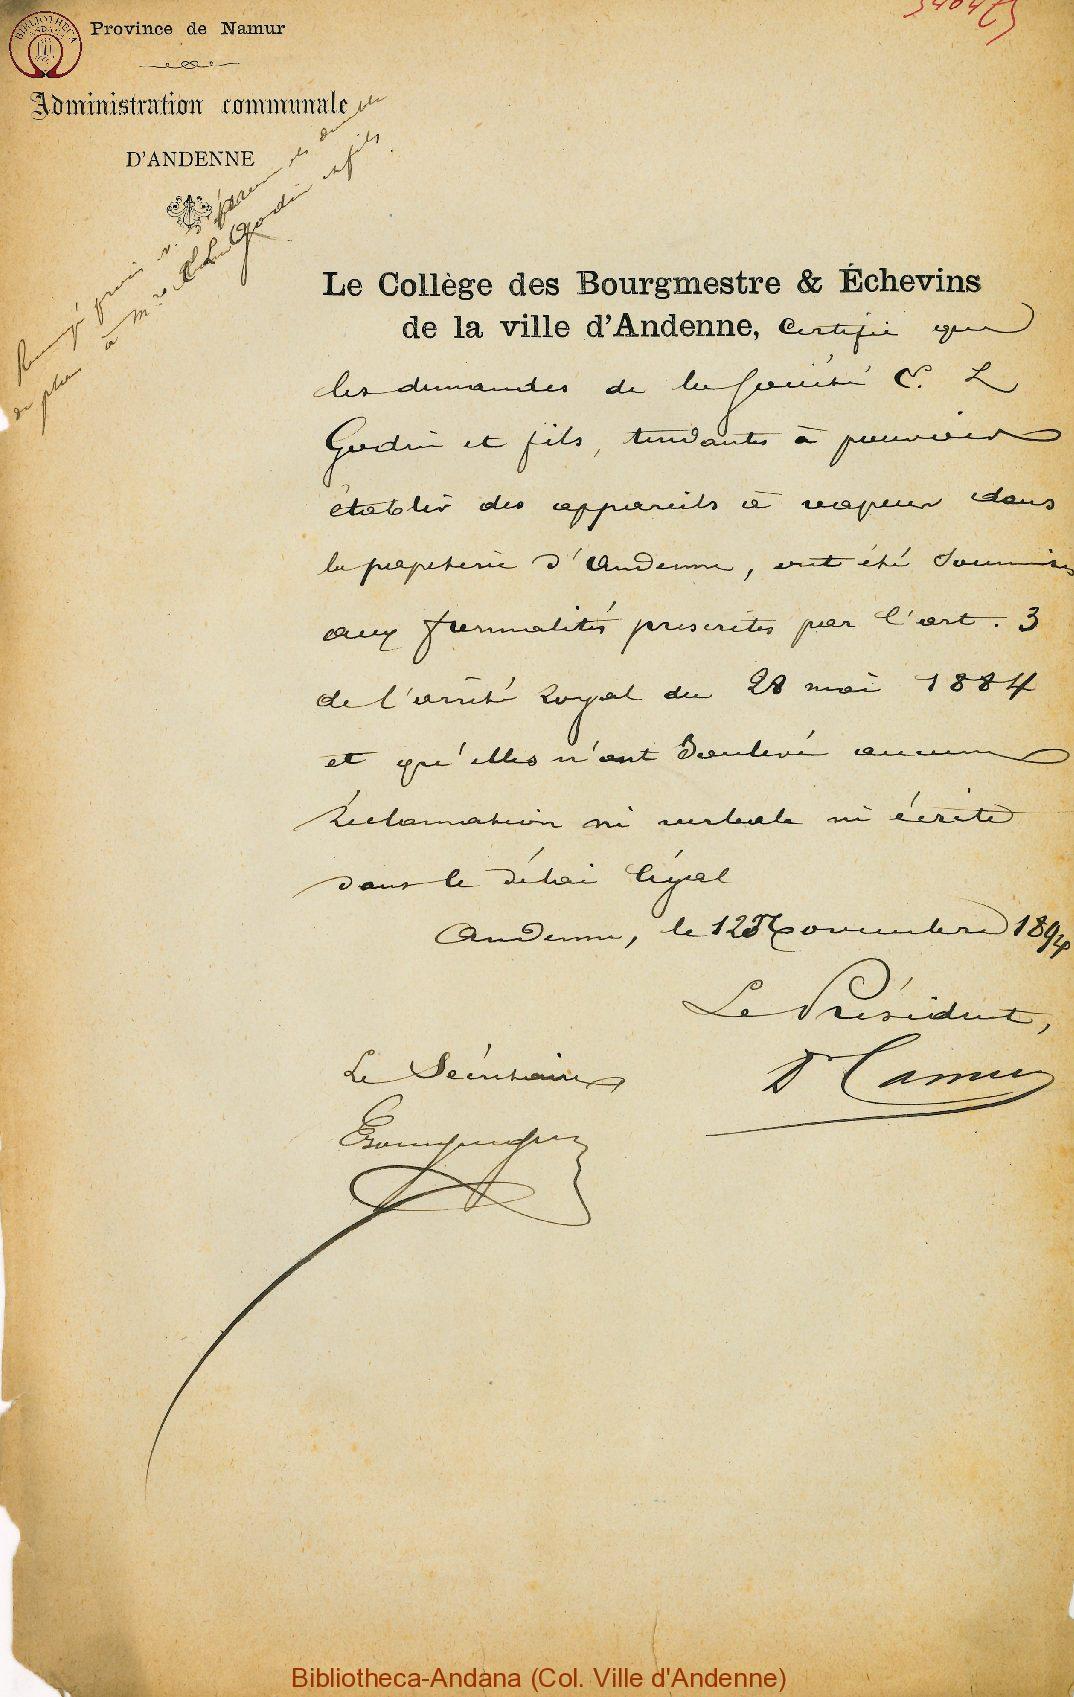 1894-11-12